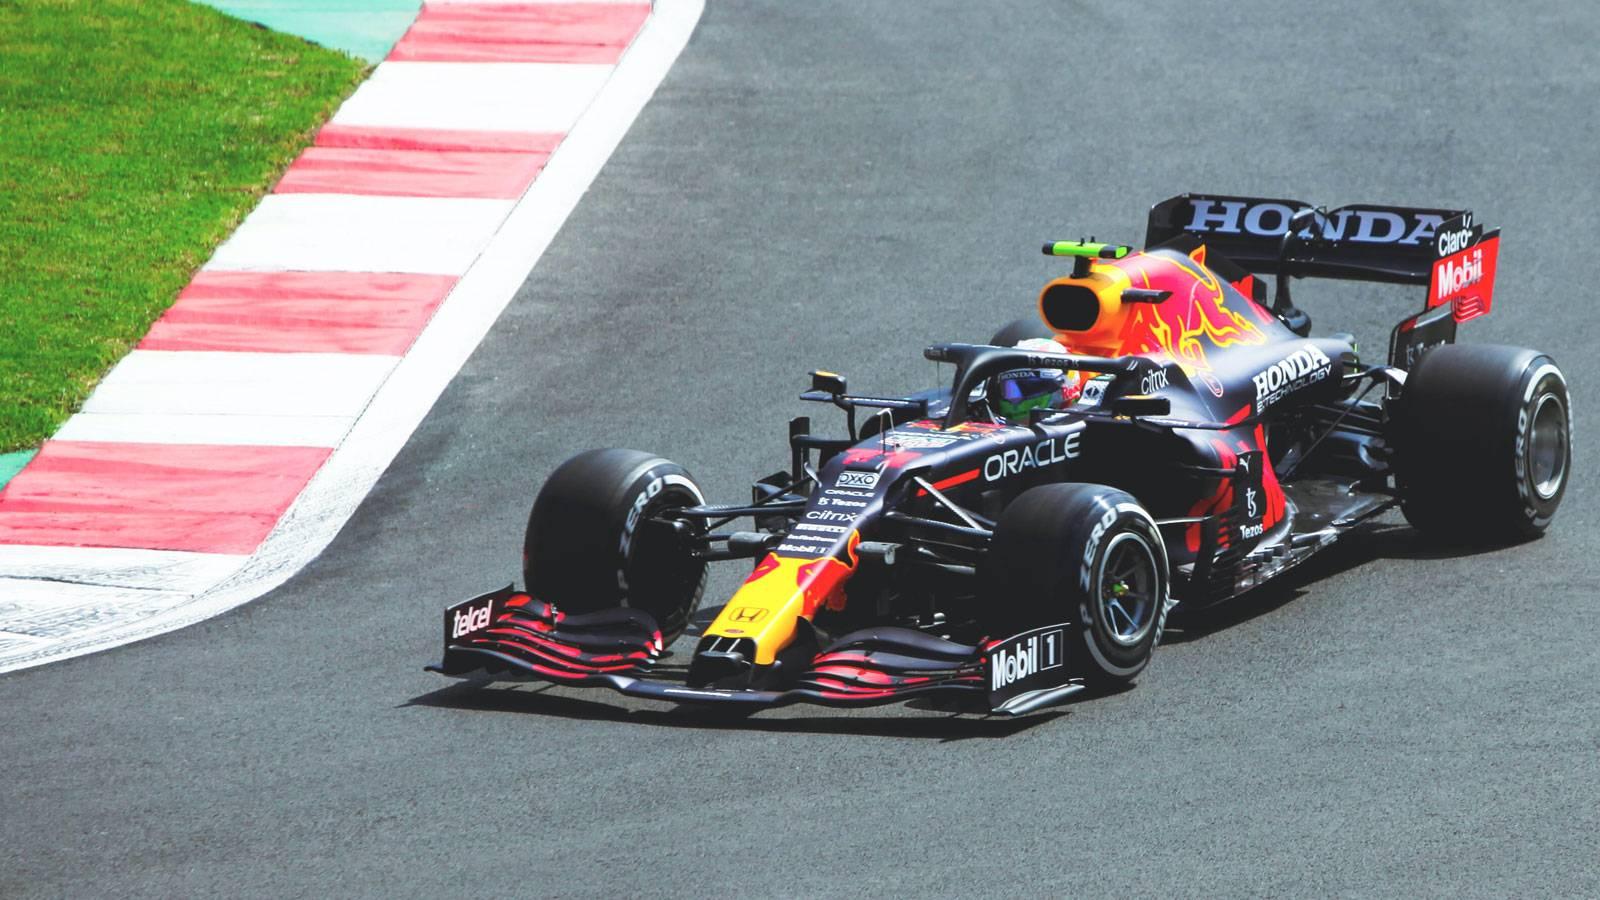 2020 US Grand Prix - Friday